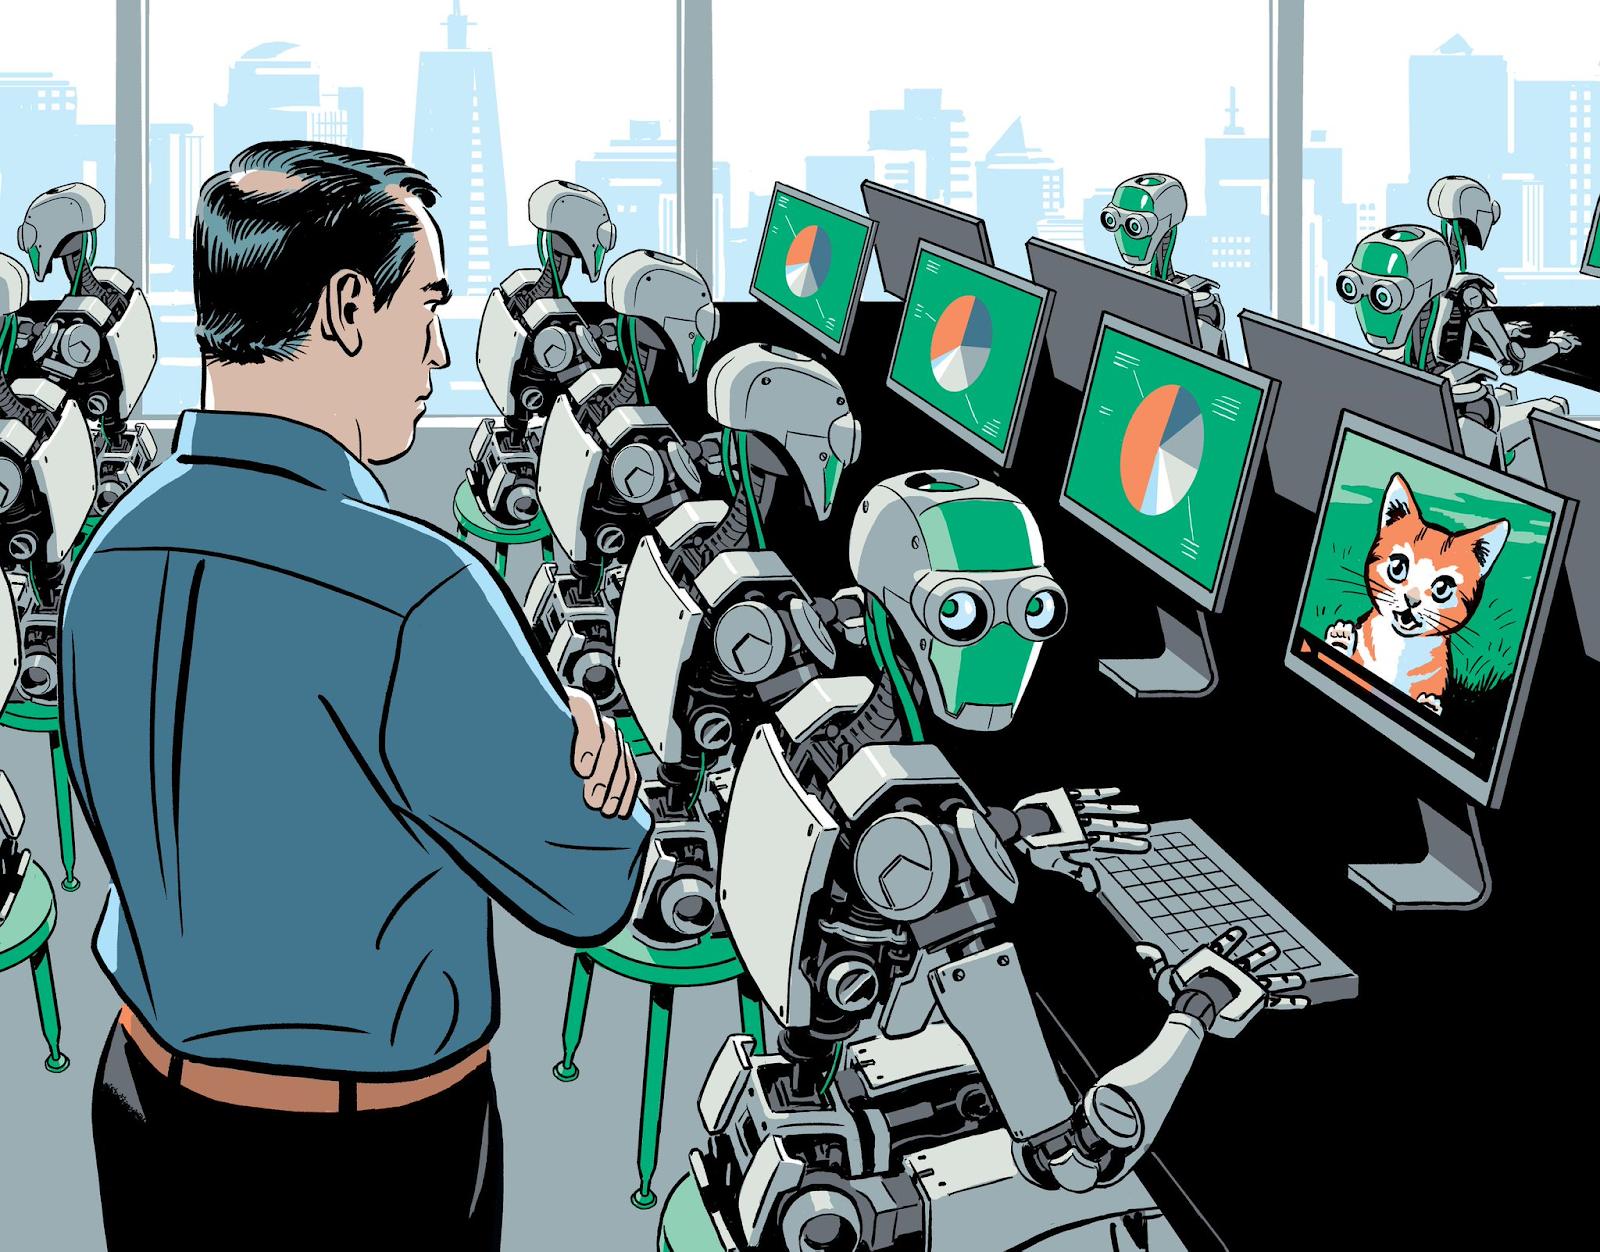 AI工程师:领着百万的薪水,都干些什么活儿?